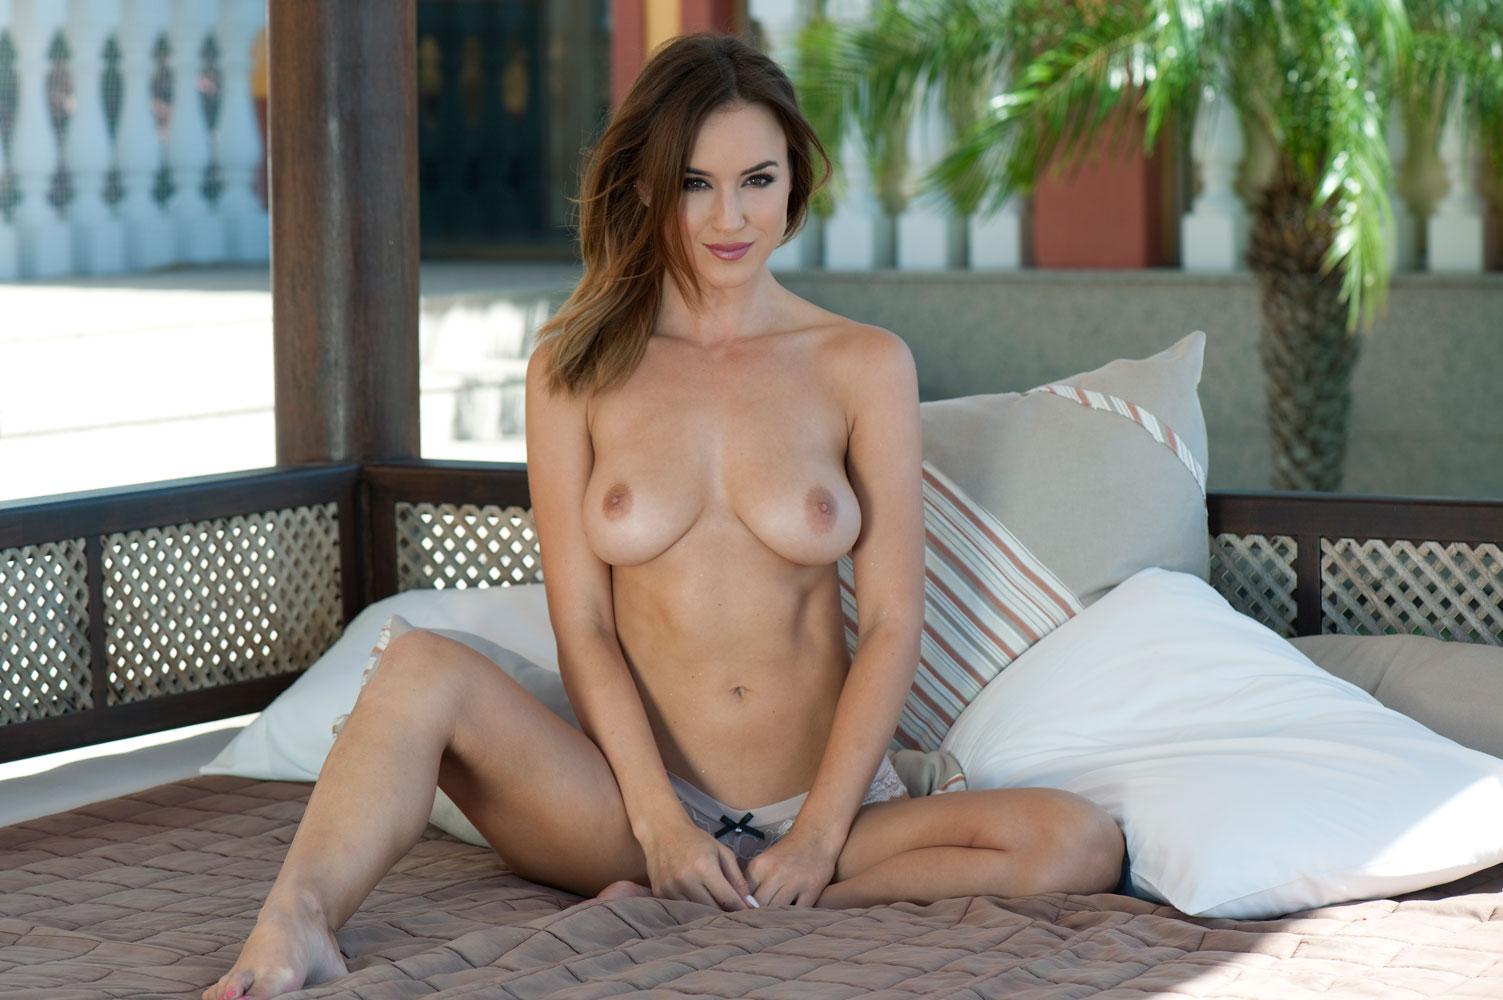 Topless Pics Of Rosie Jon...